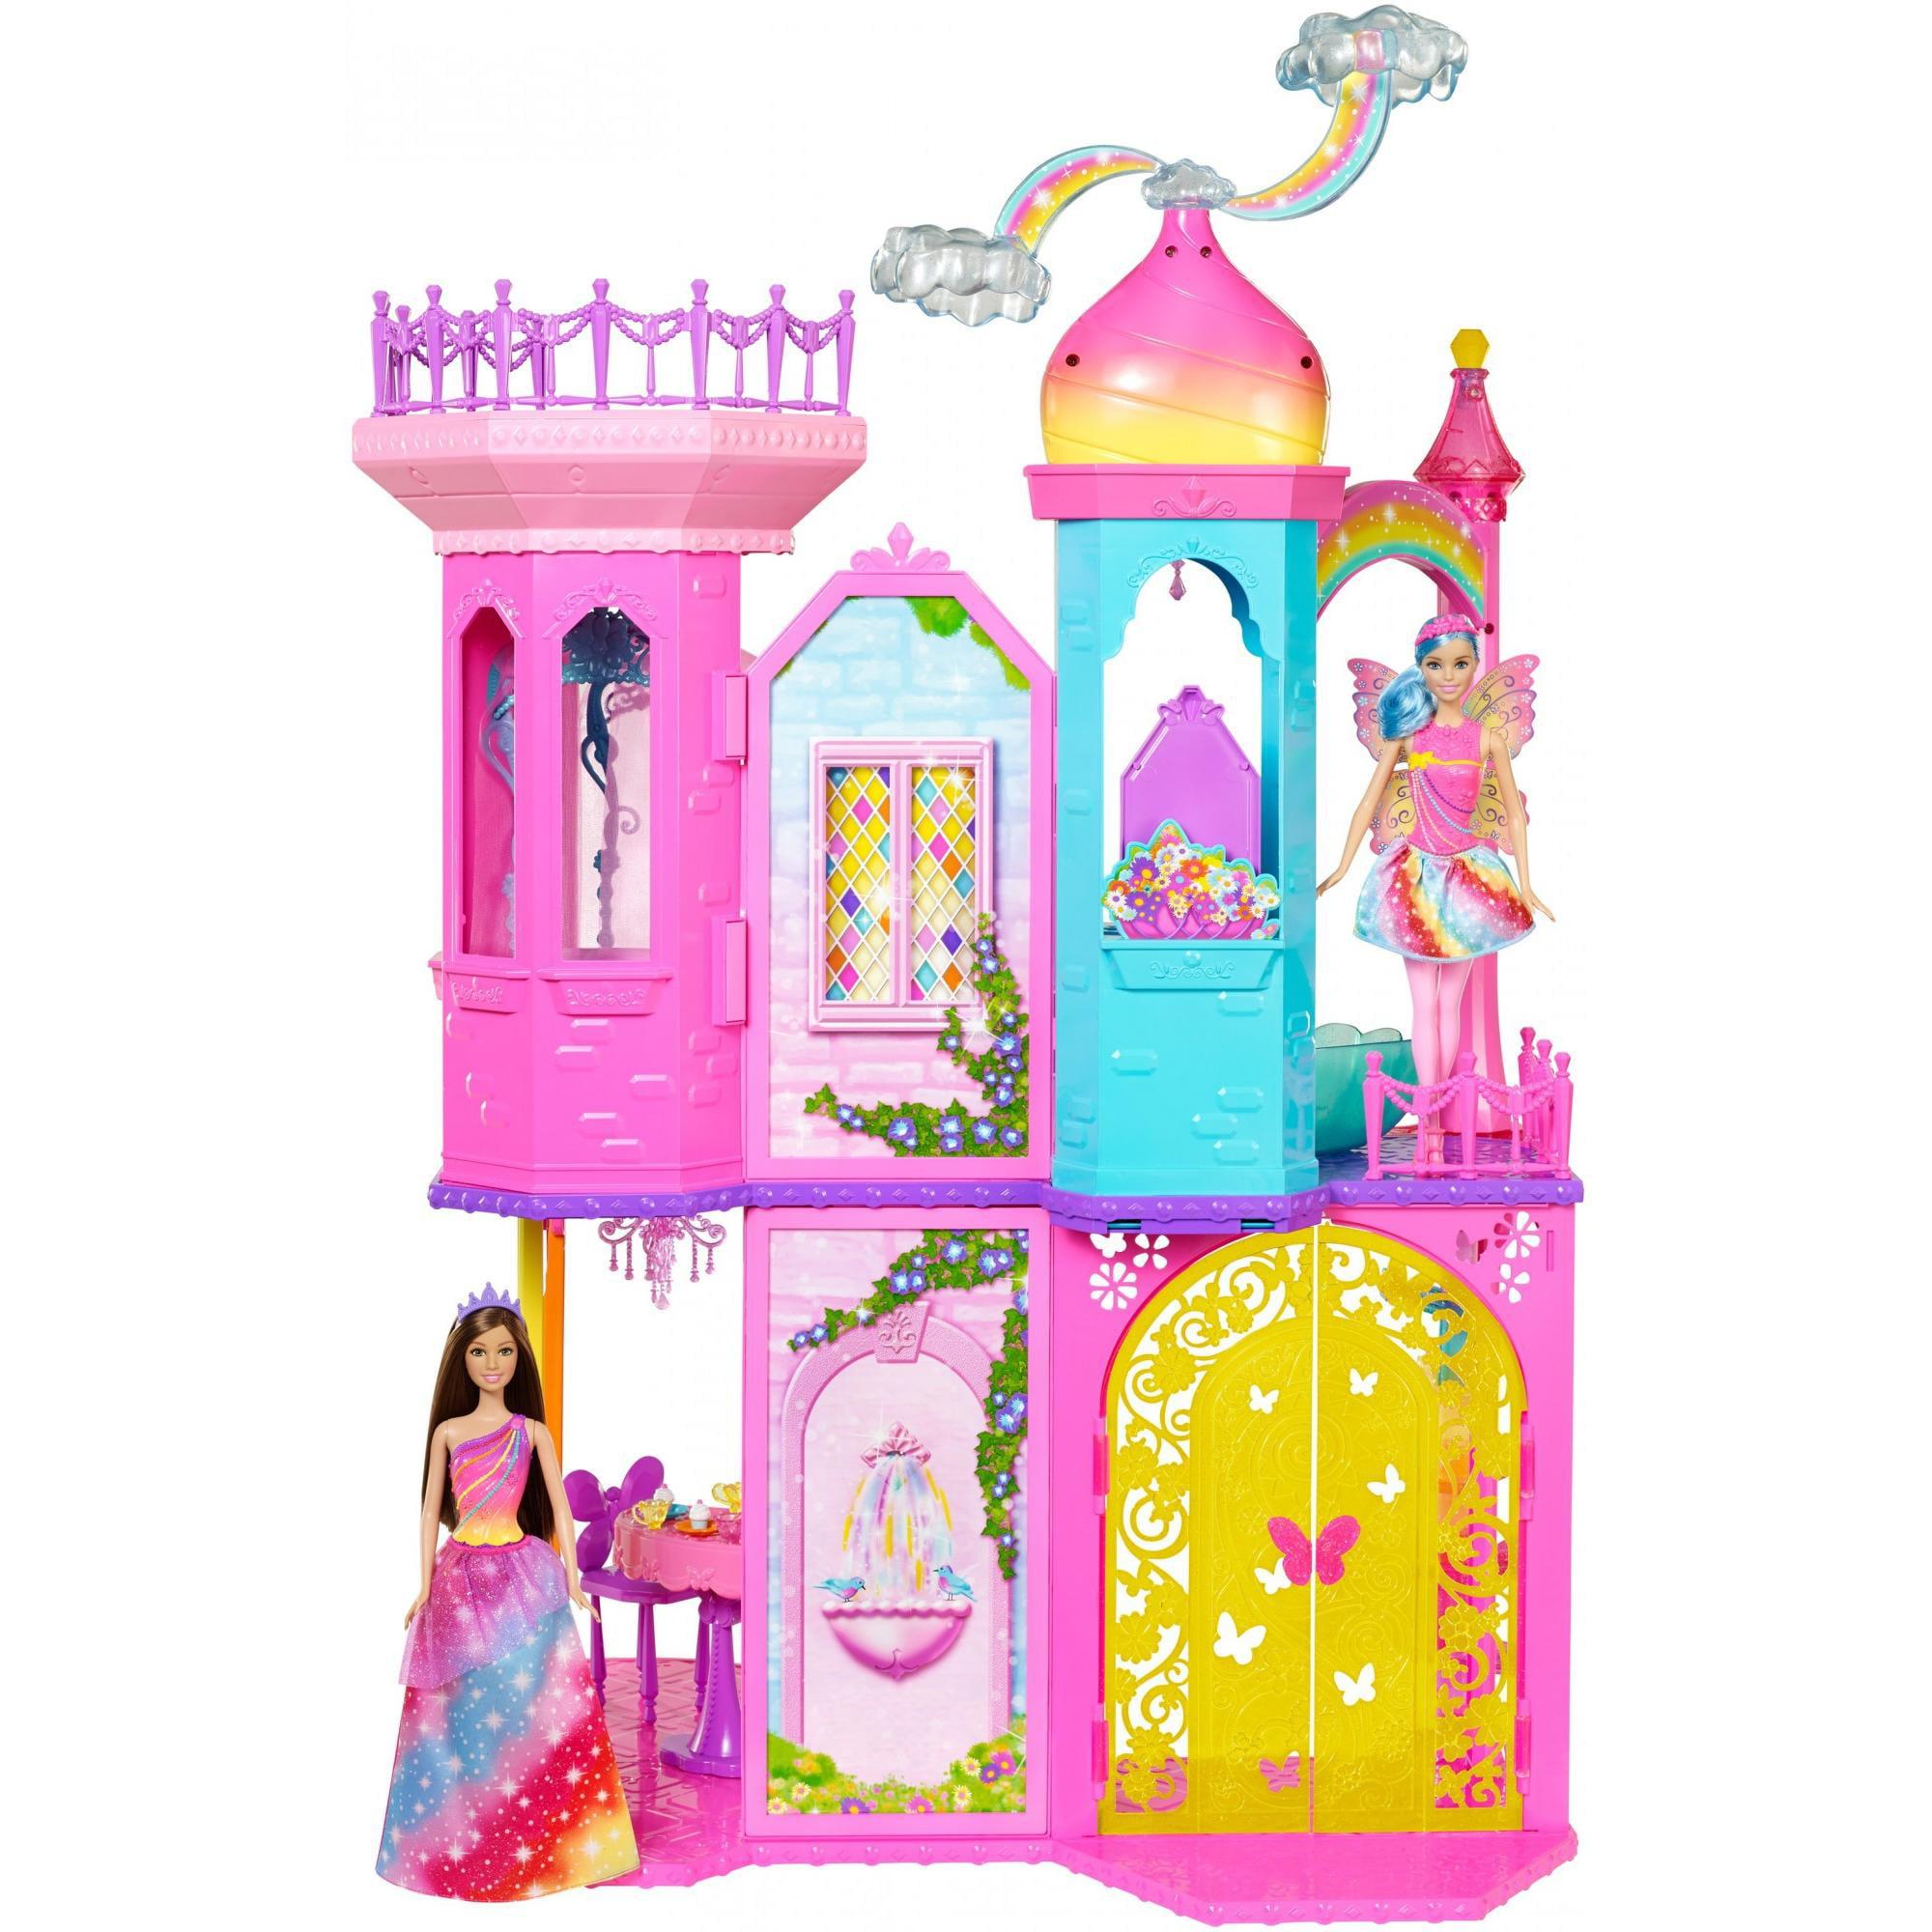 Barbie Rainbow Cove Princess Castle Playset - Walmart.com